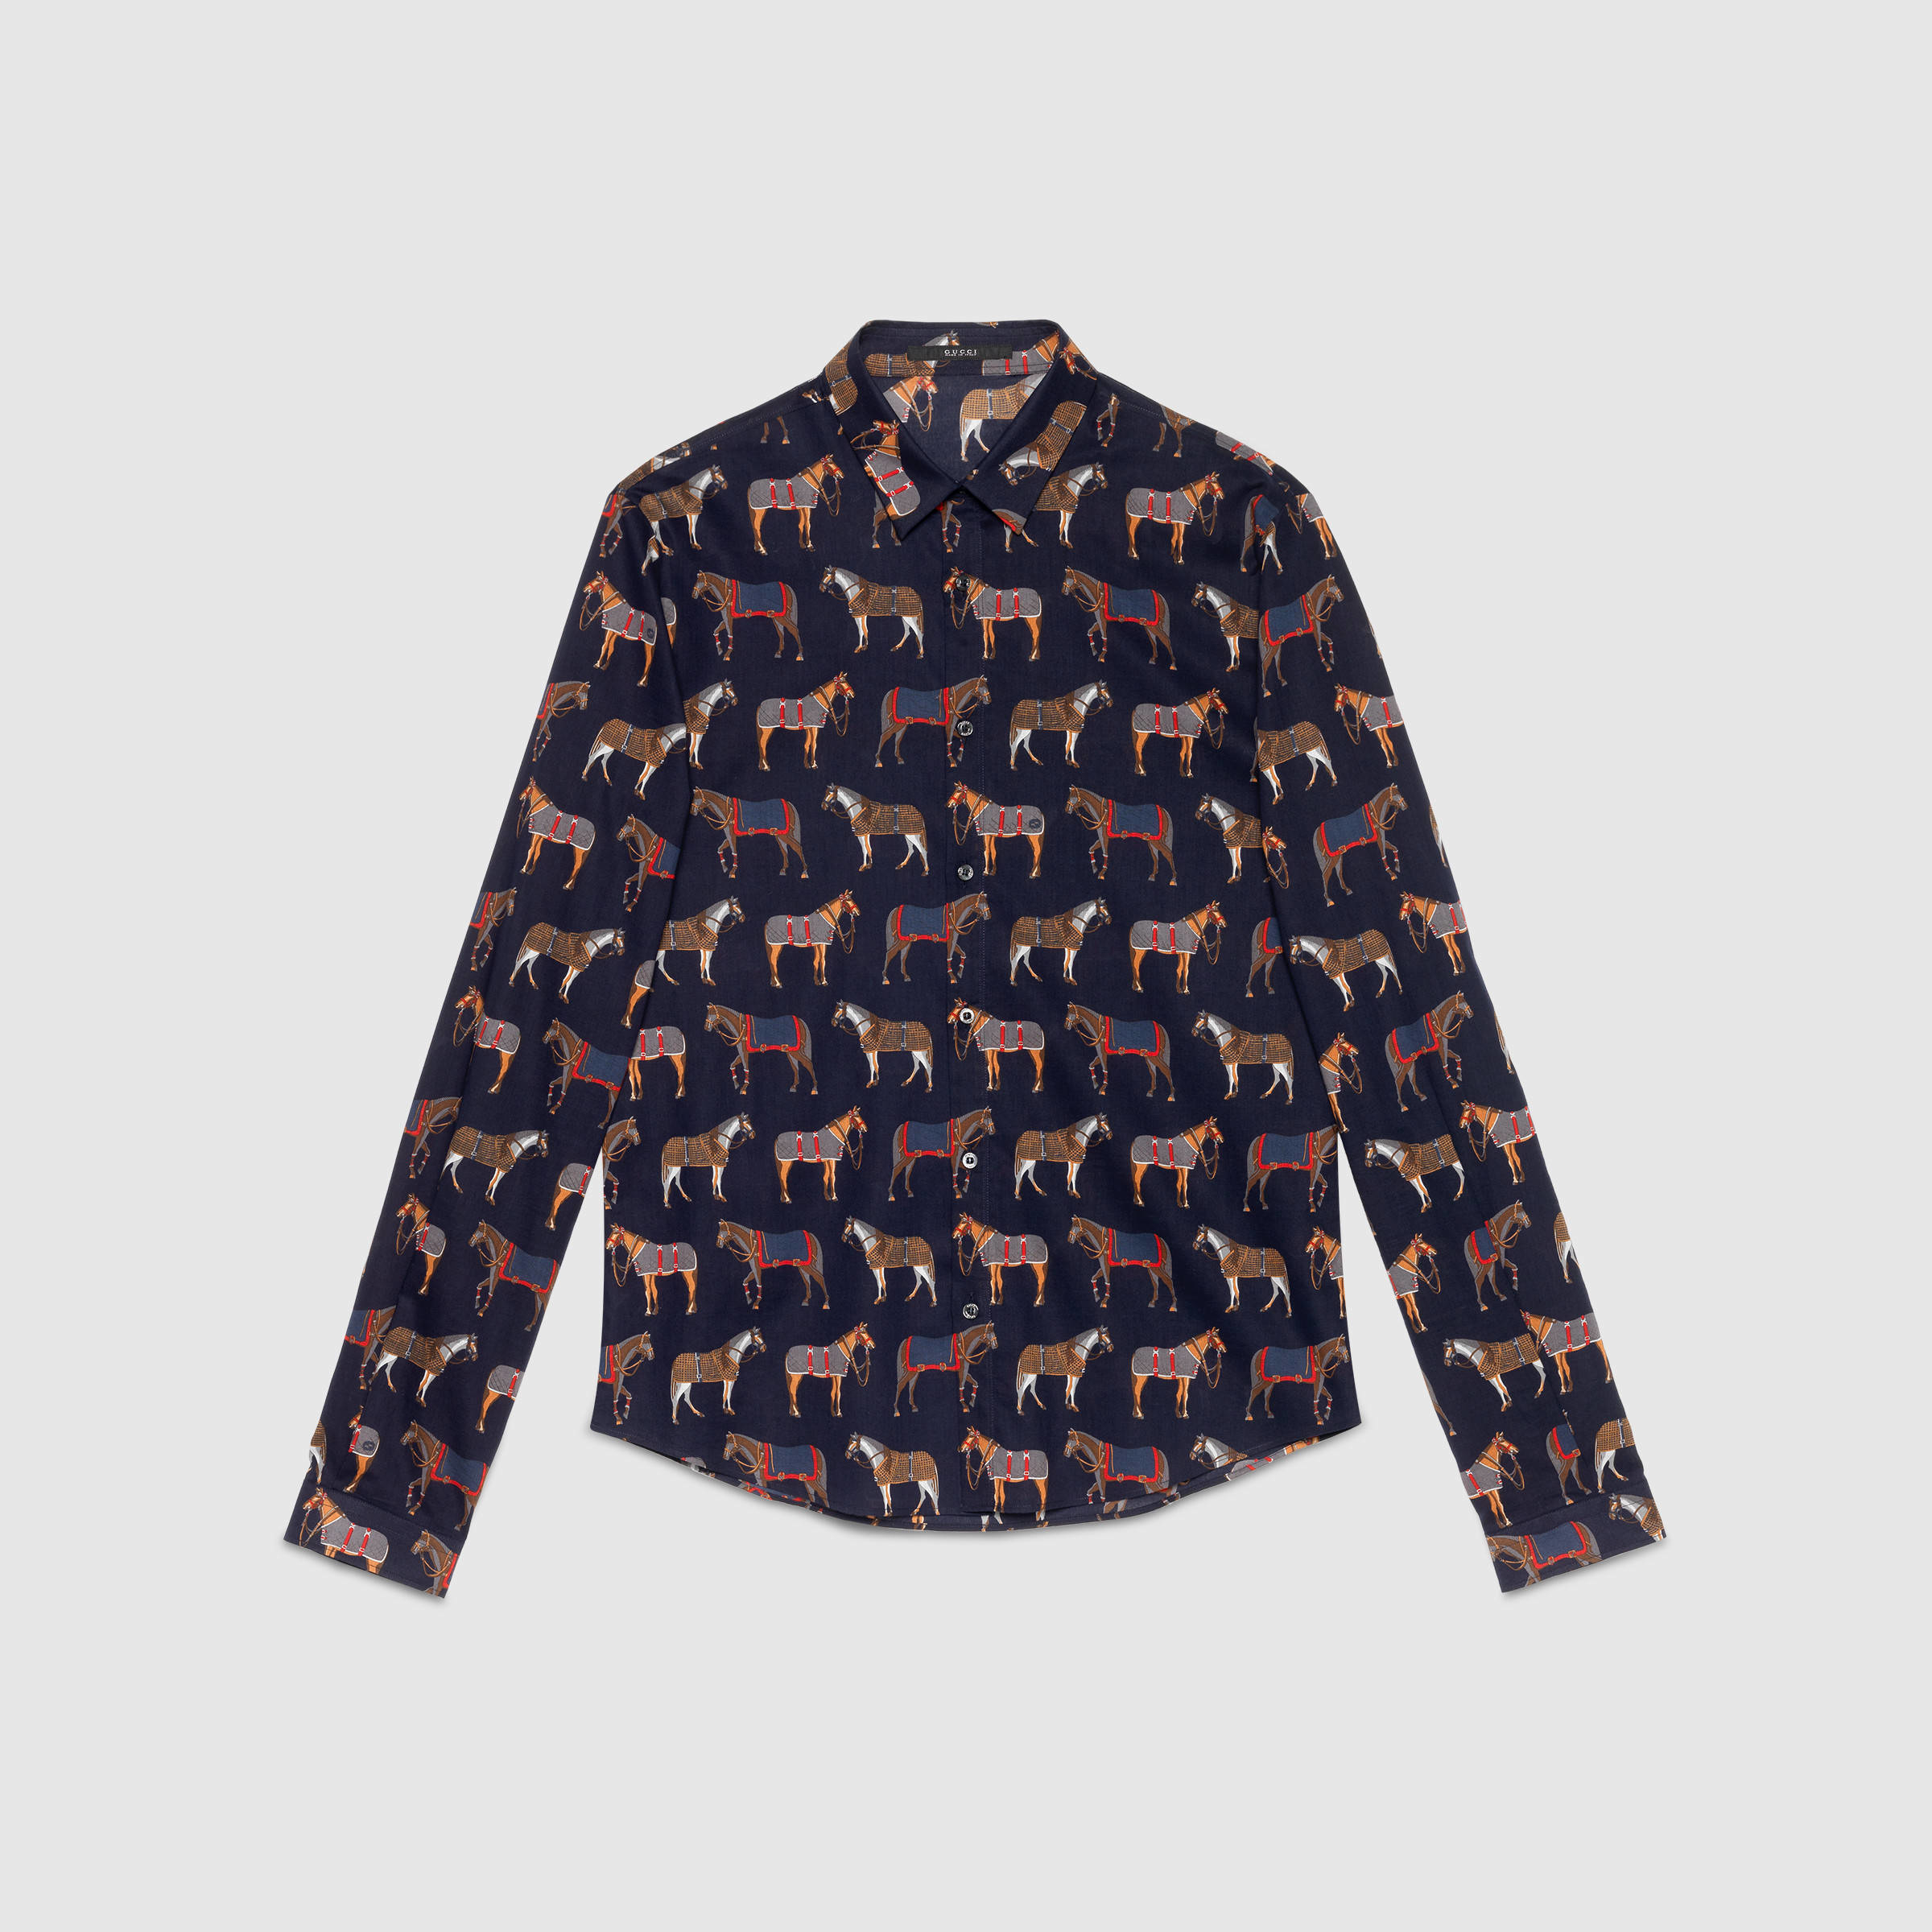 b52281e1c382 Gucci Horse Print Duke Shirt in Blue for Men - Lyst